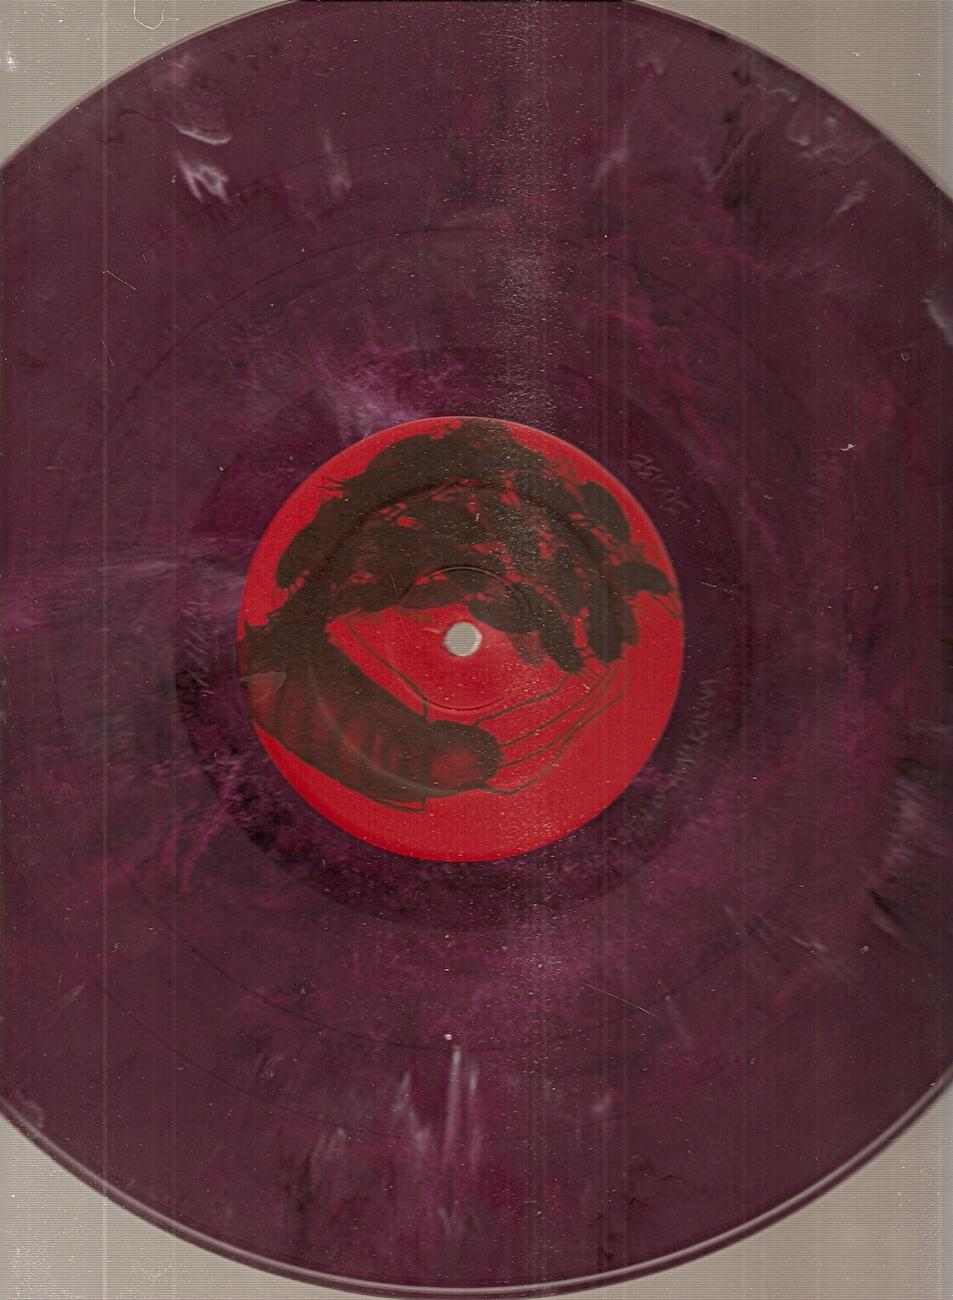 LP--The Death Of Anna Karina   (Art Rock, Noise, Punk )